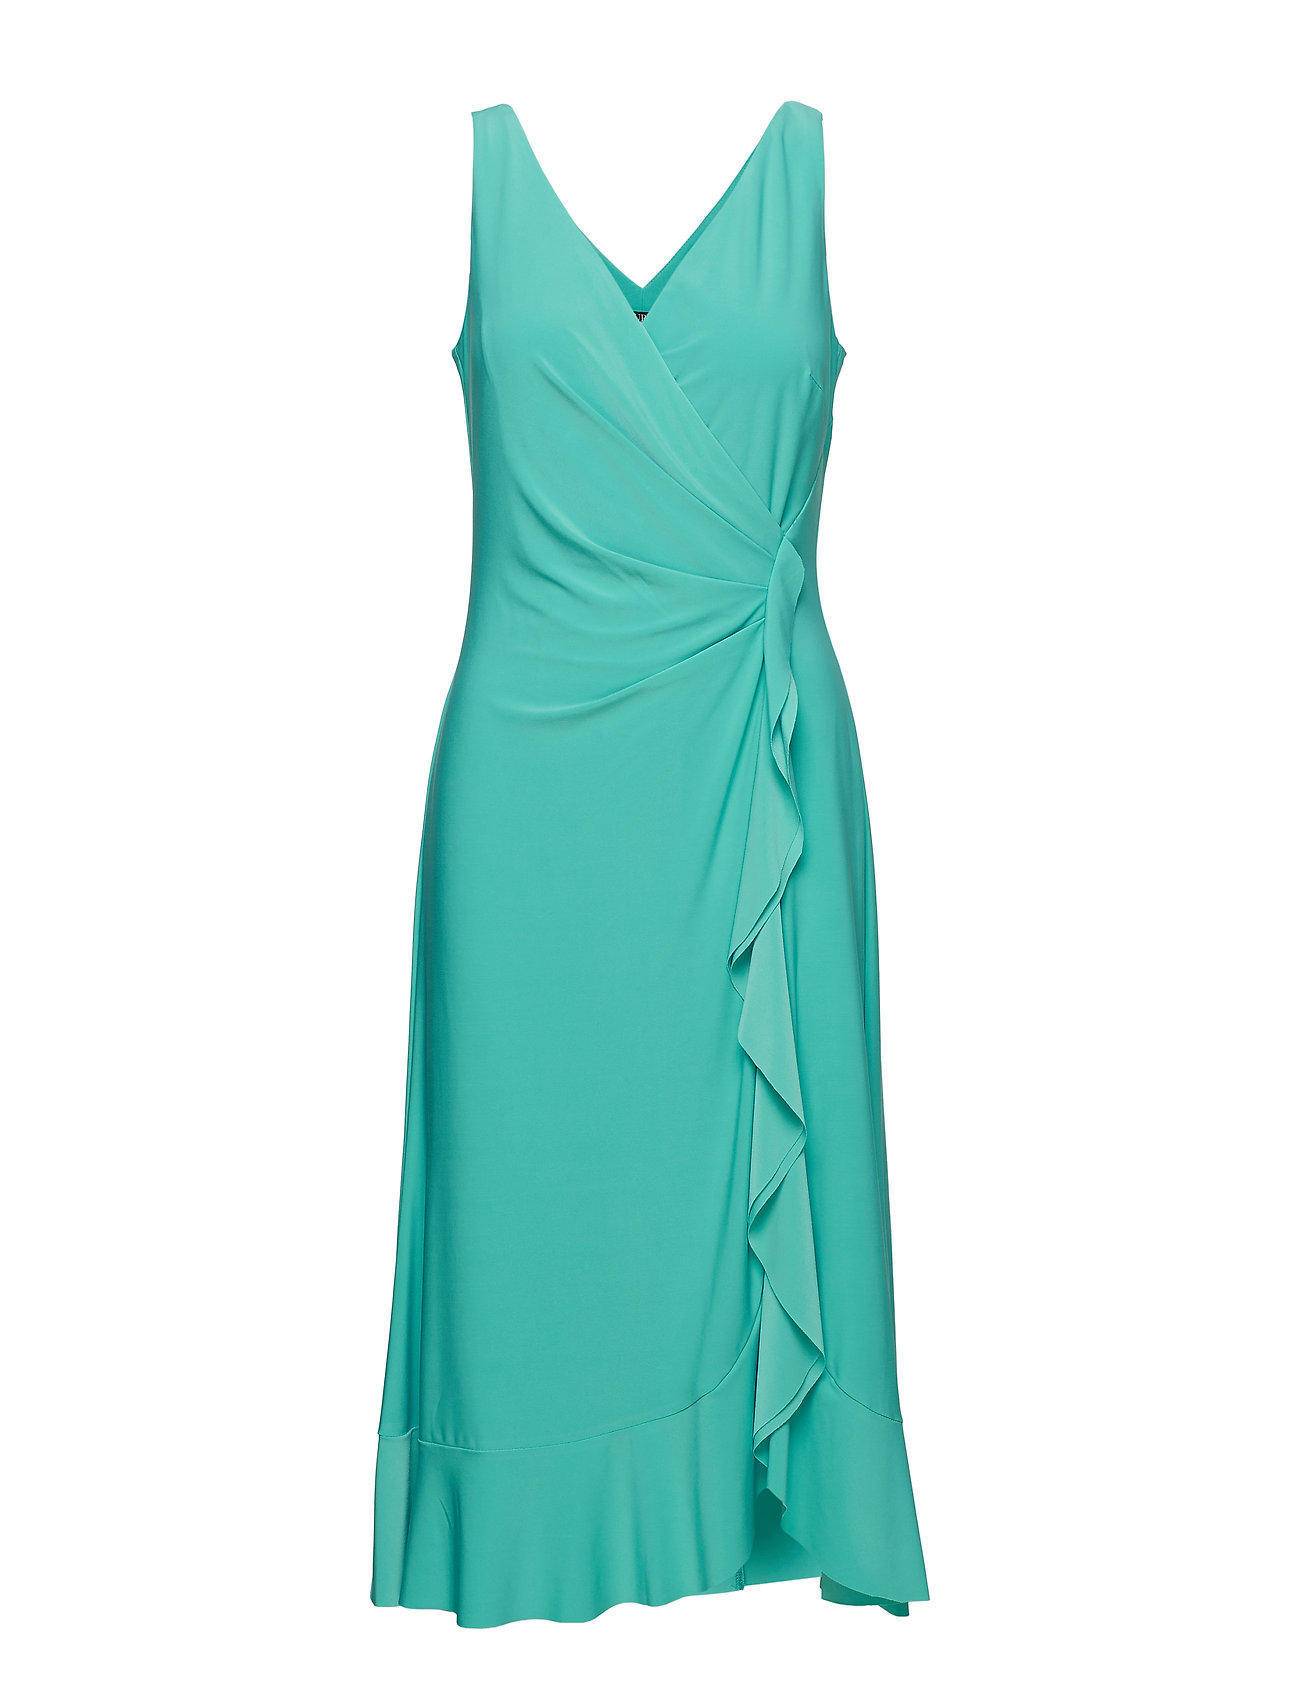 Lauren Ralph Lauren Ruffle-Trim Ruched Dress